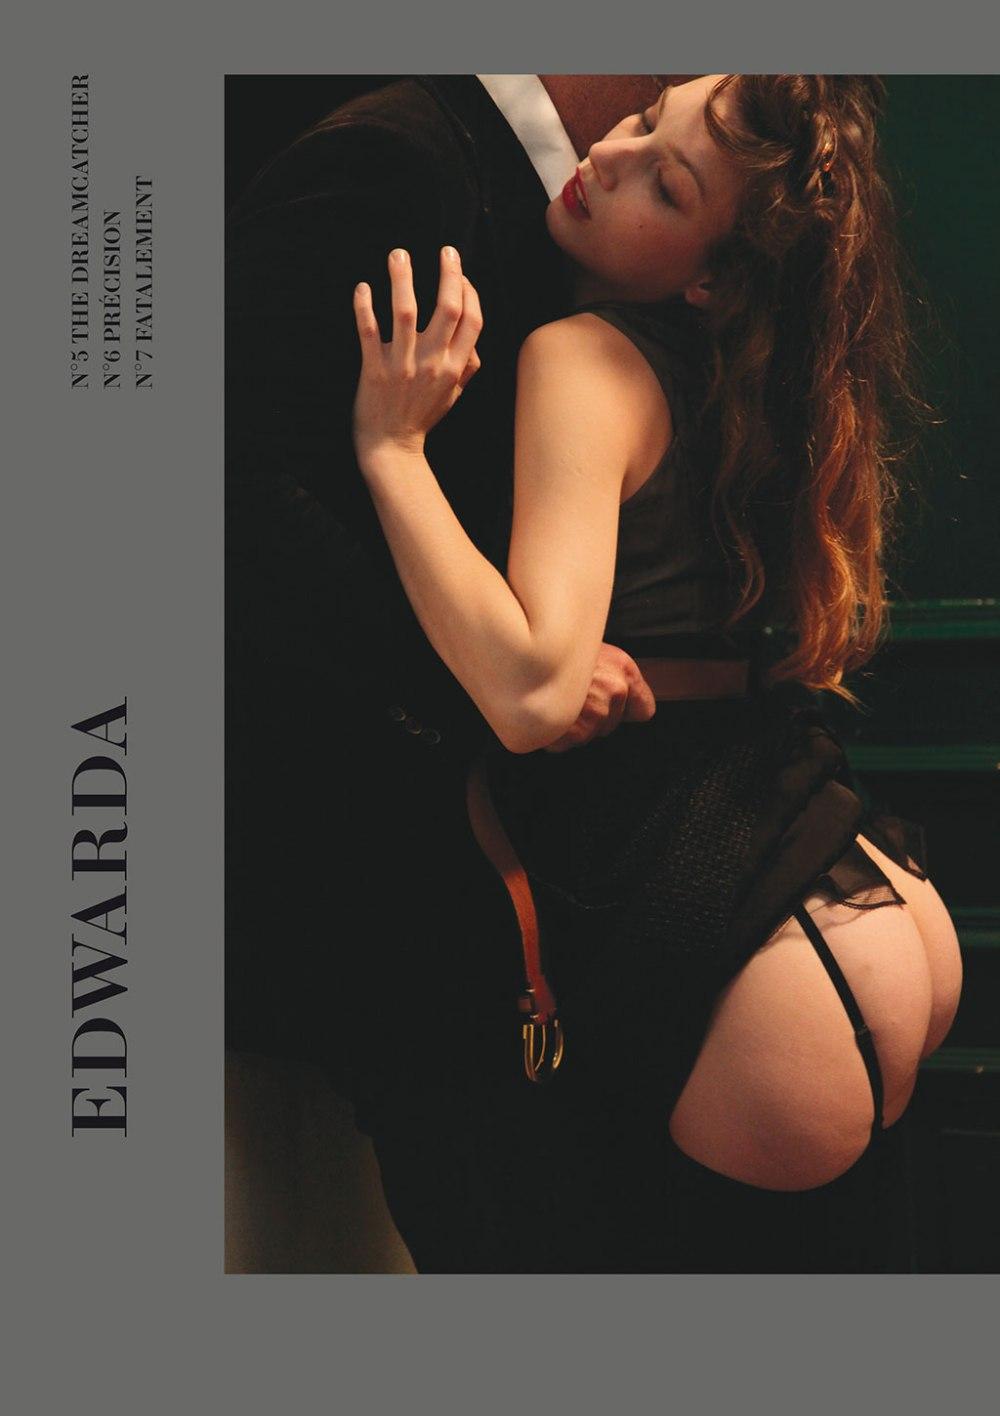 edwarda-couverture-coffret-05-06-07